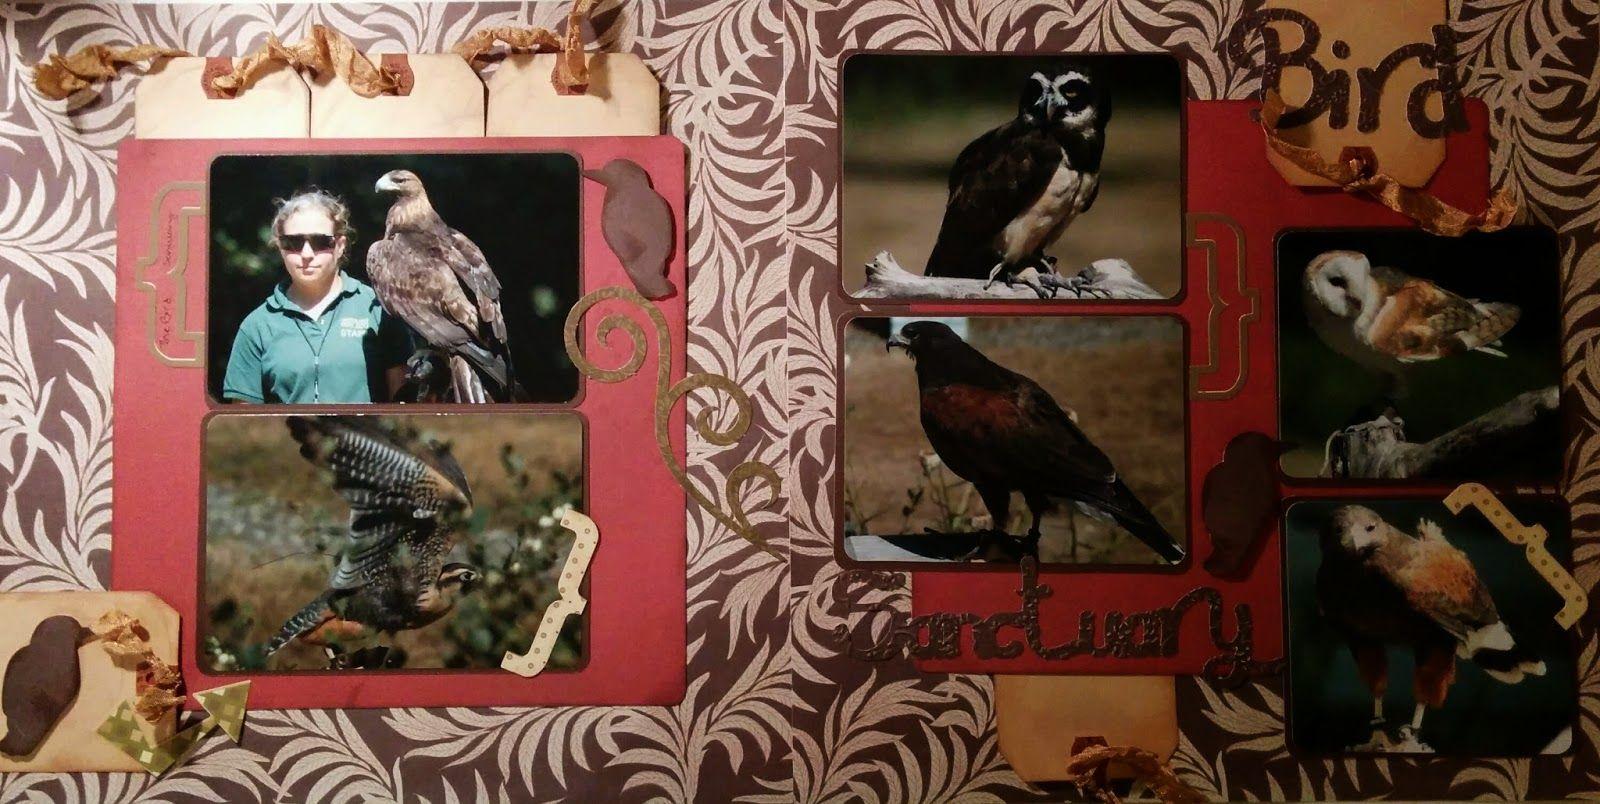 "- Noah's ABC Cricut Cartridge for the birds - Type Candy Cricut Cartridge for the title ""Bird Sanctuary"""